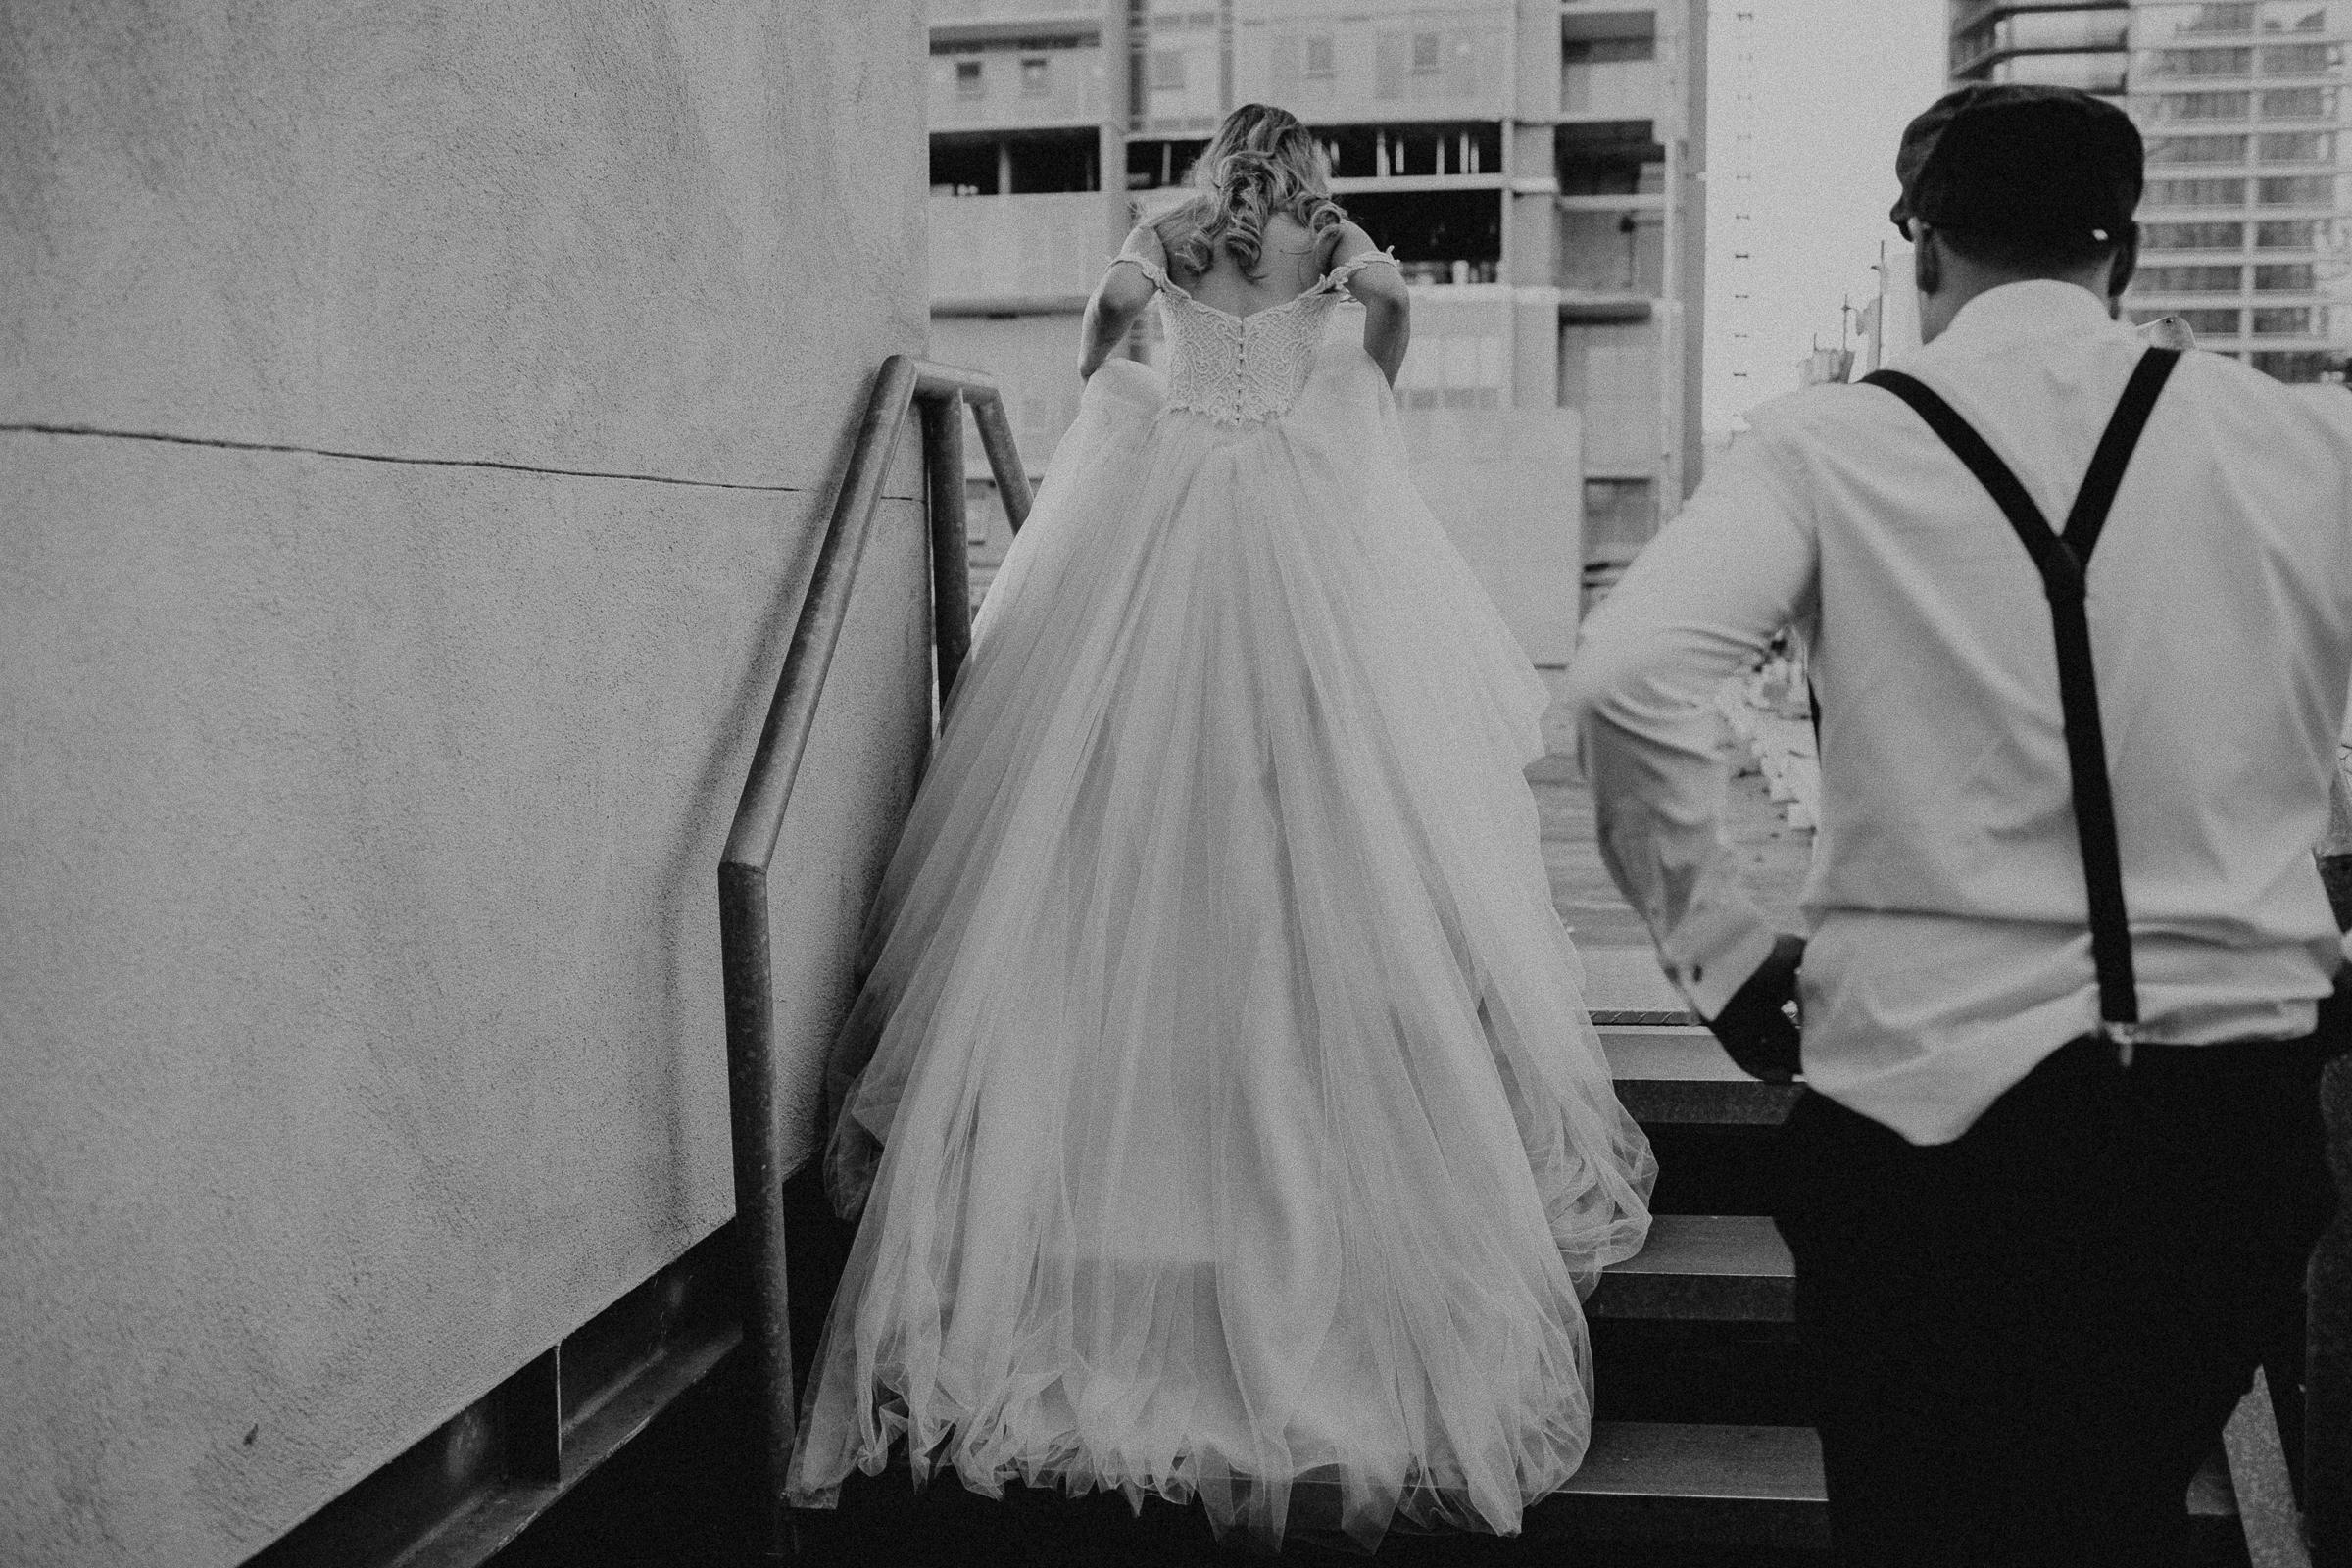 Gretchen Gause Photography | Los Angeles Hudson Loft Wedding #hudsonloft #laweddingphotographer #DTLA #weddingplanning #romanticwedding #rooftopwedding #weddingphotography #weddingdress #brideandgroom